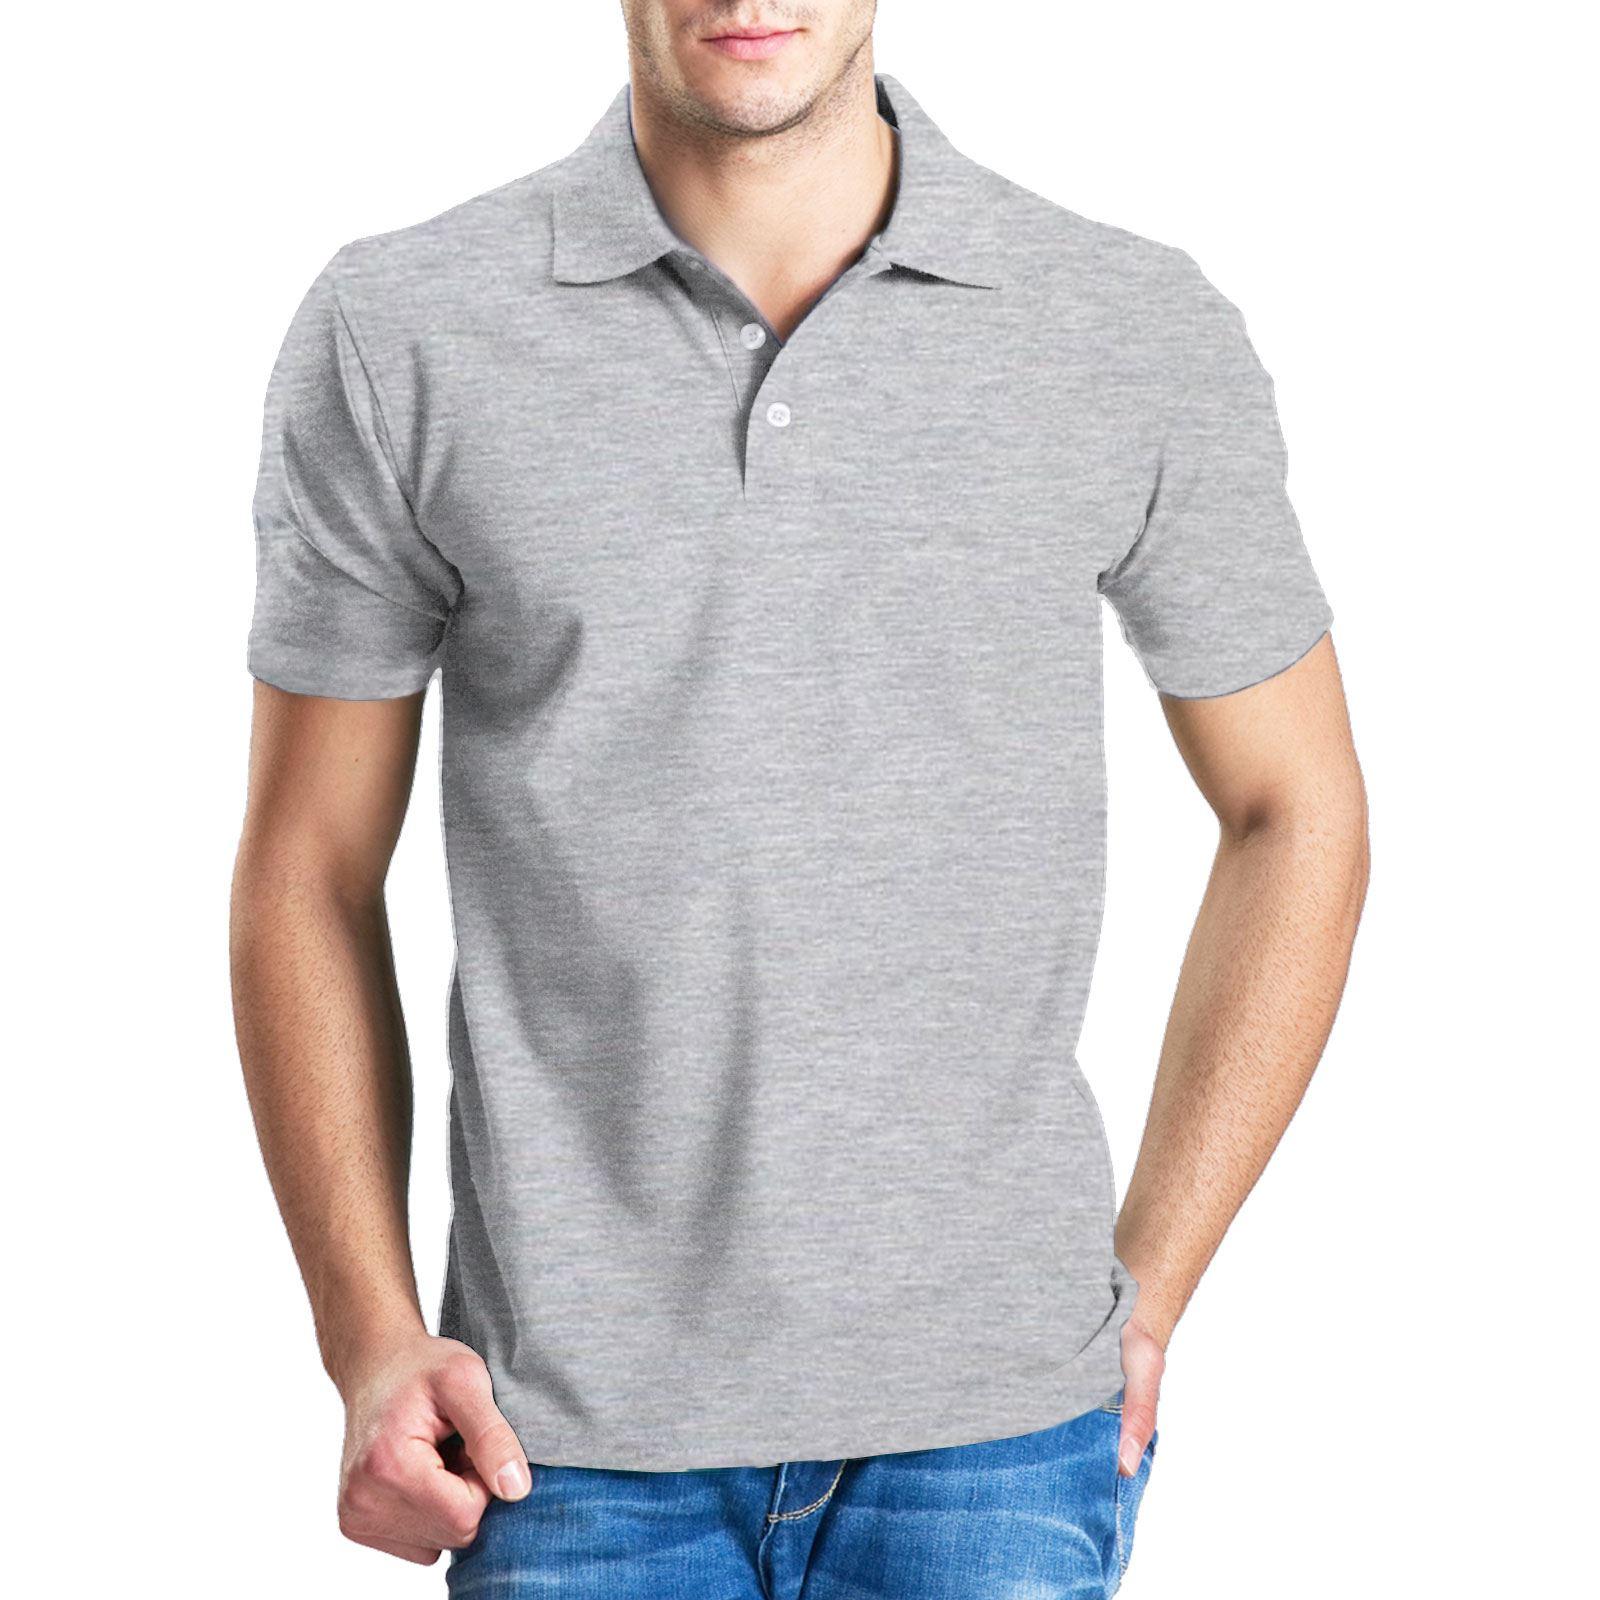 Mens polo shirt striped short sleeve top golf tennis t for Womens golf shirts xxl